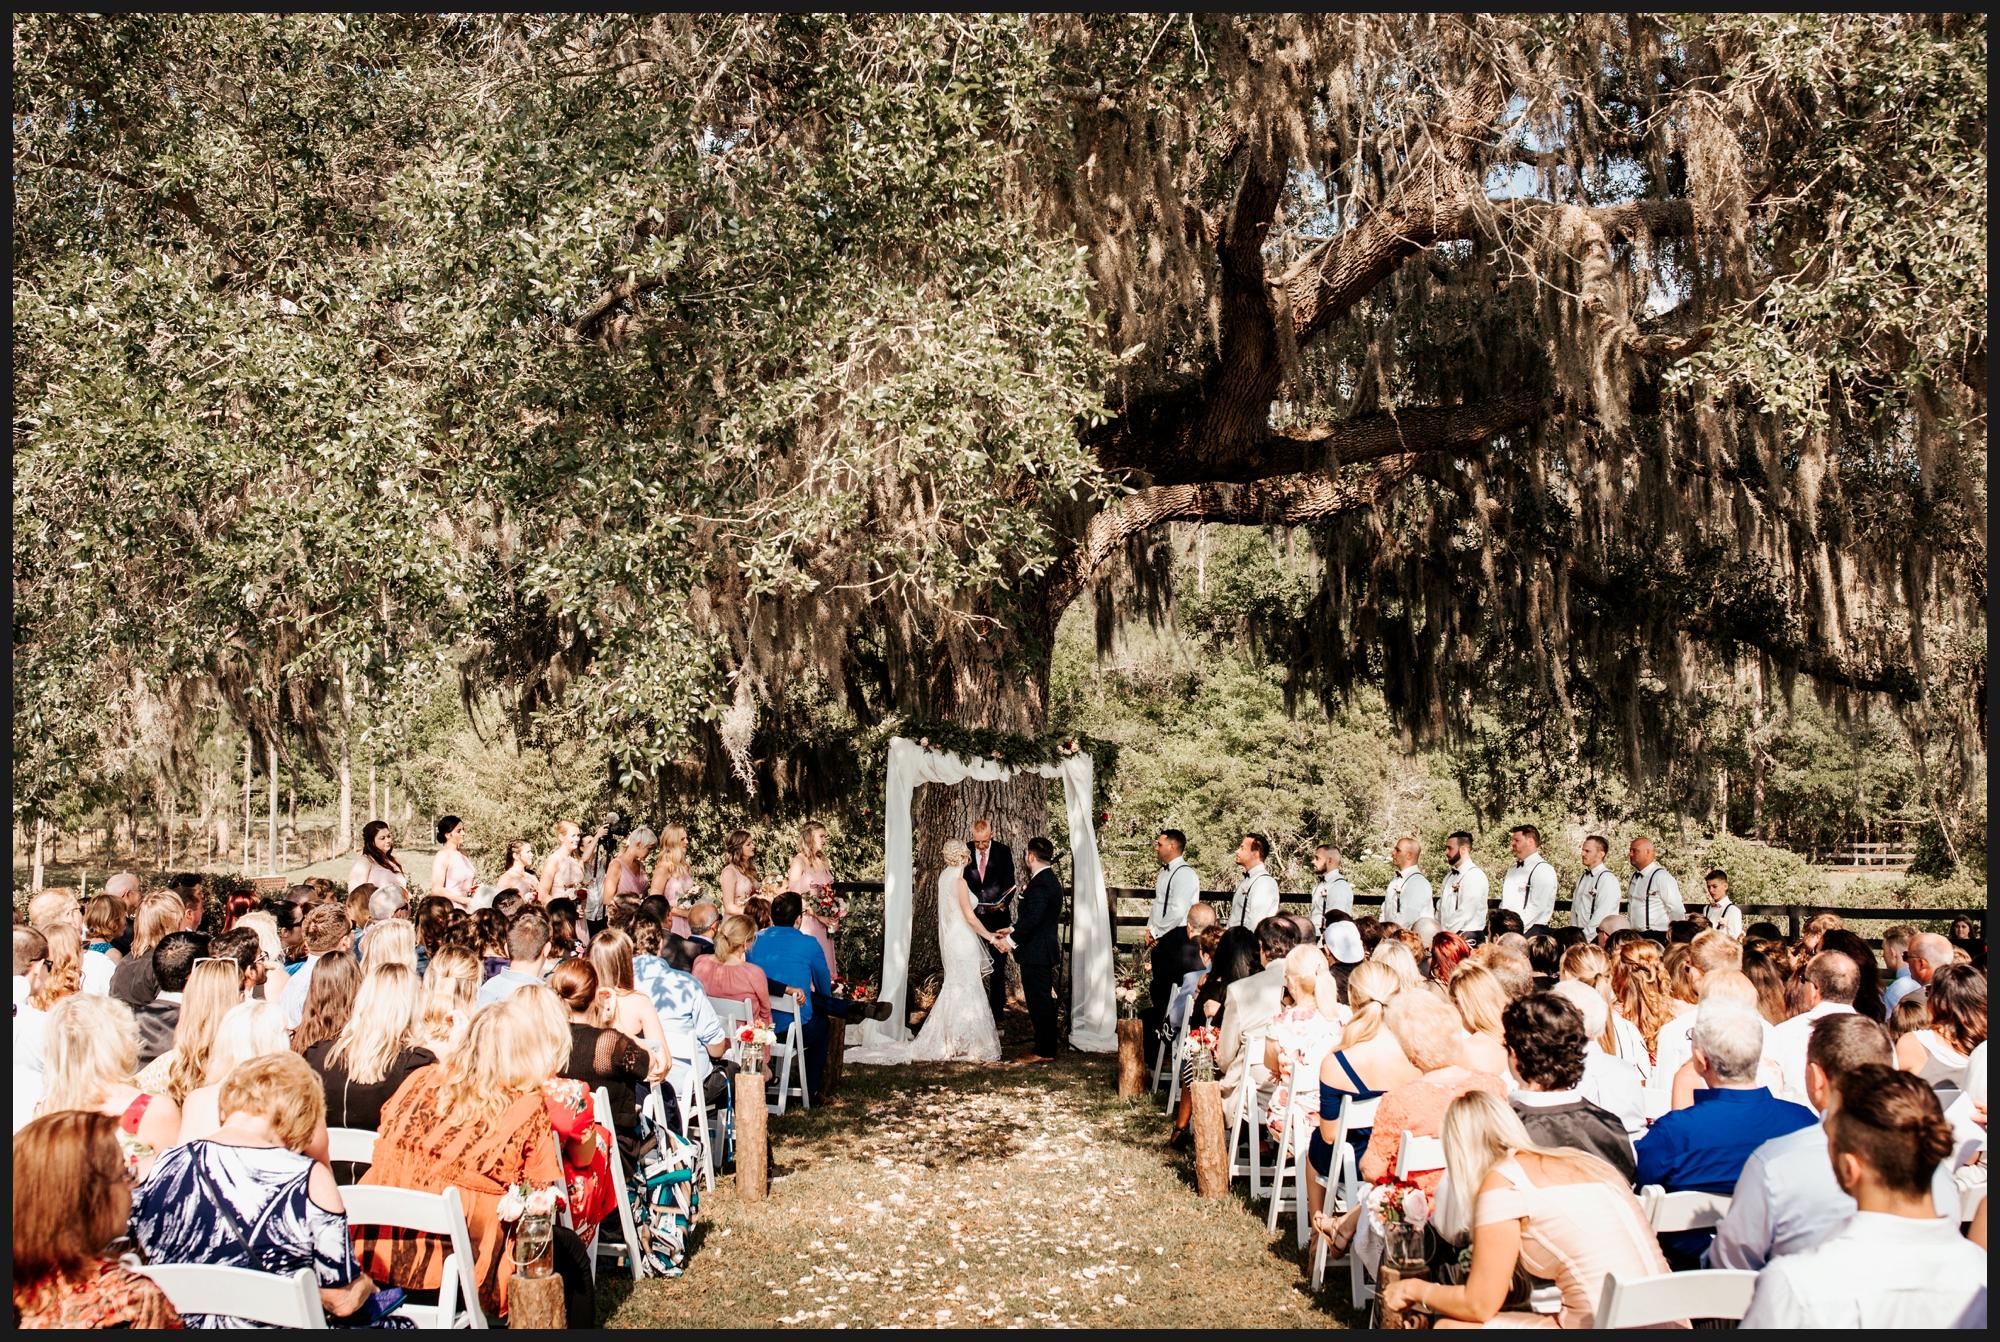 Orlando-Wedding-Photographer-destination-wedding-photographer-florida-wedding-photographer-hawaii-wedding-photographer_0597.jpg